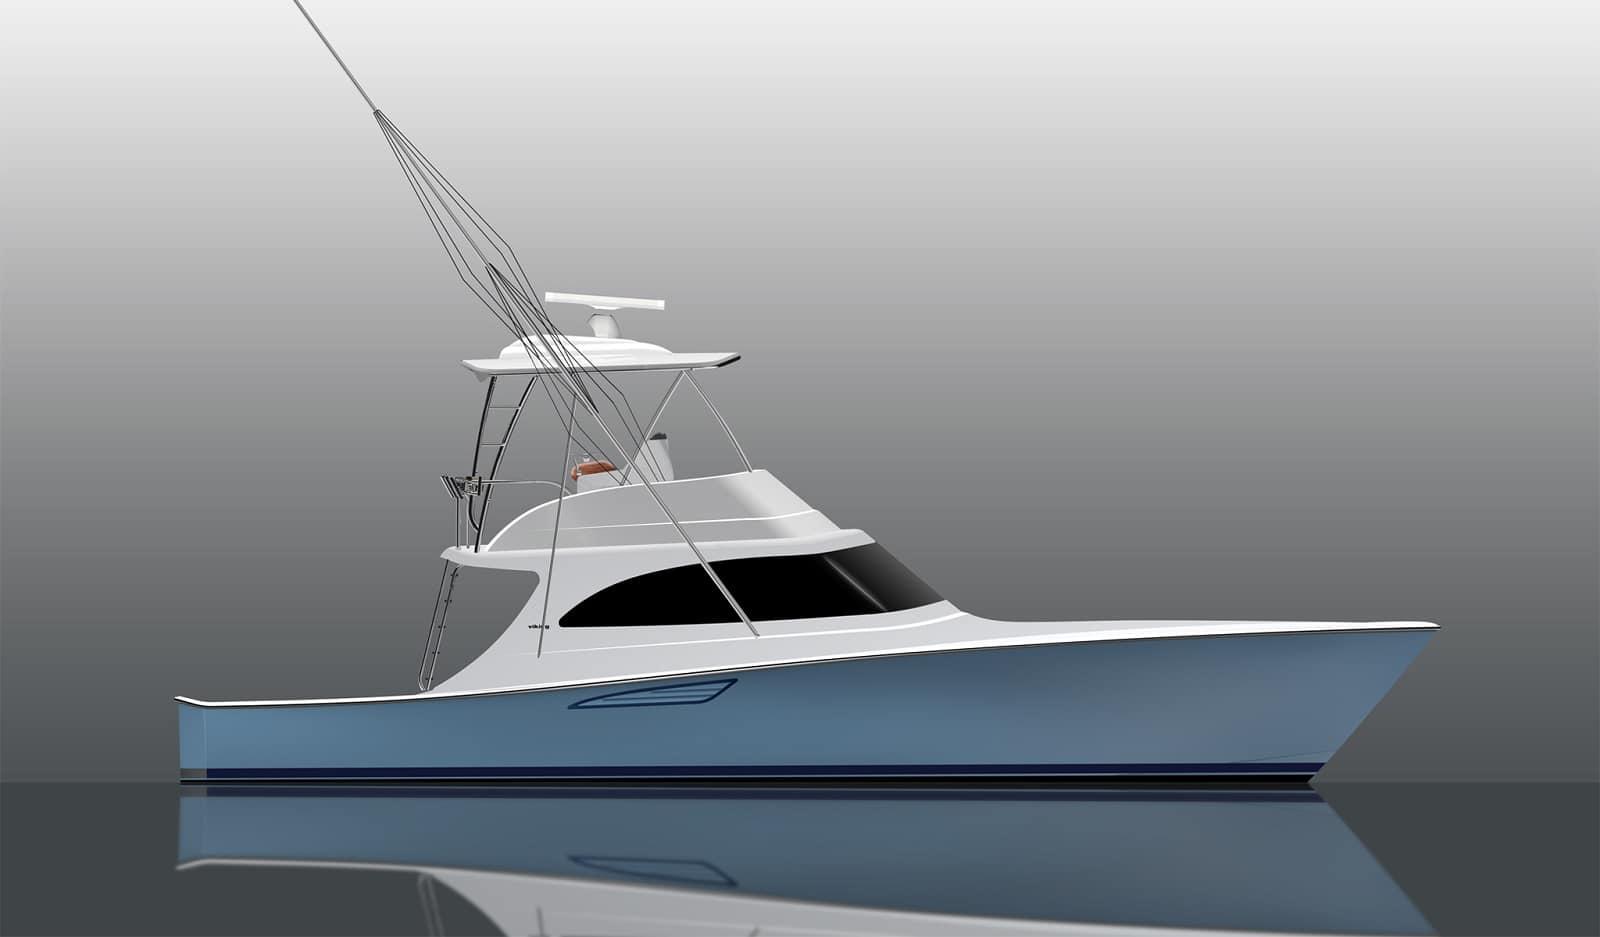 New Viking Yachts 46 Billfish Yacht